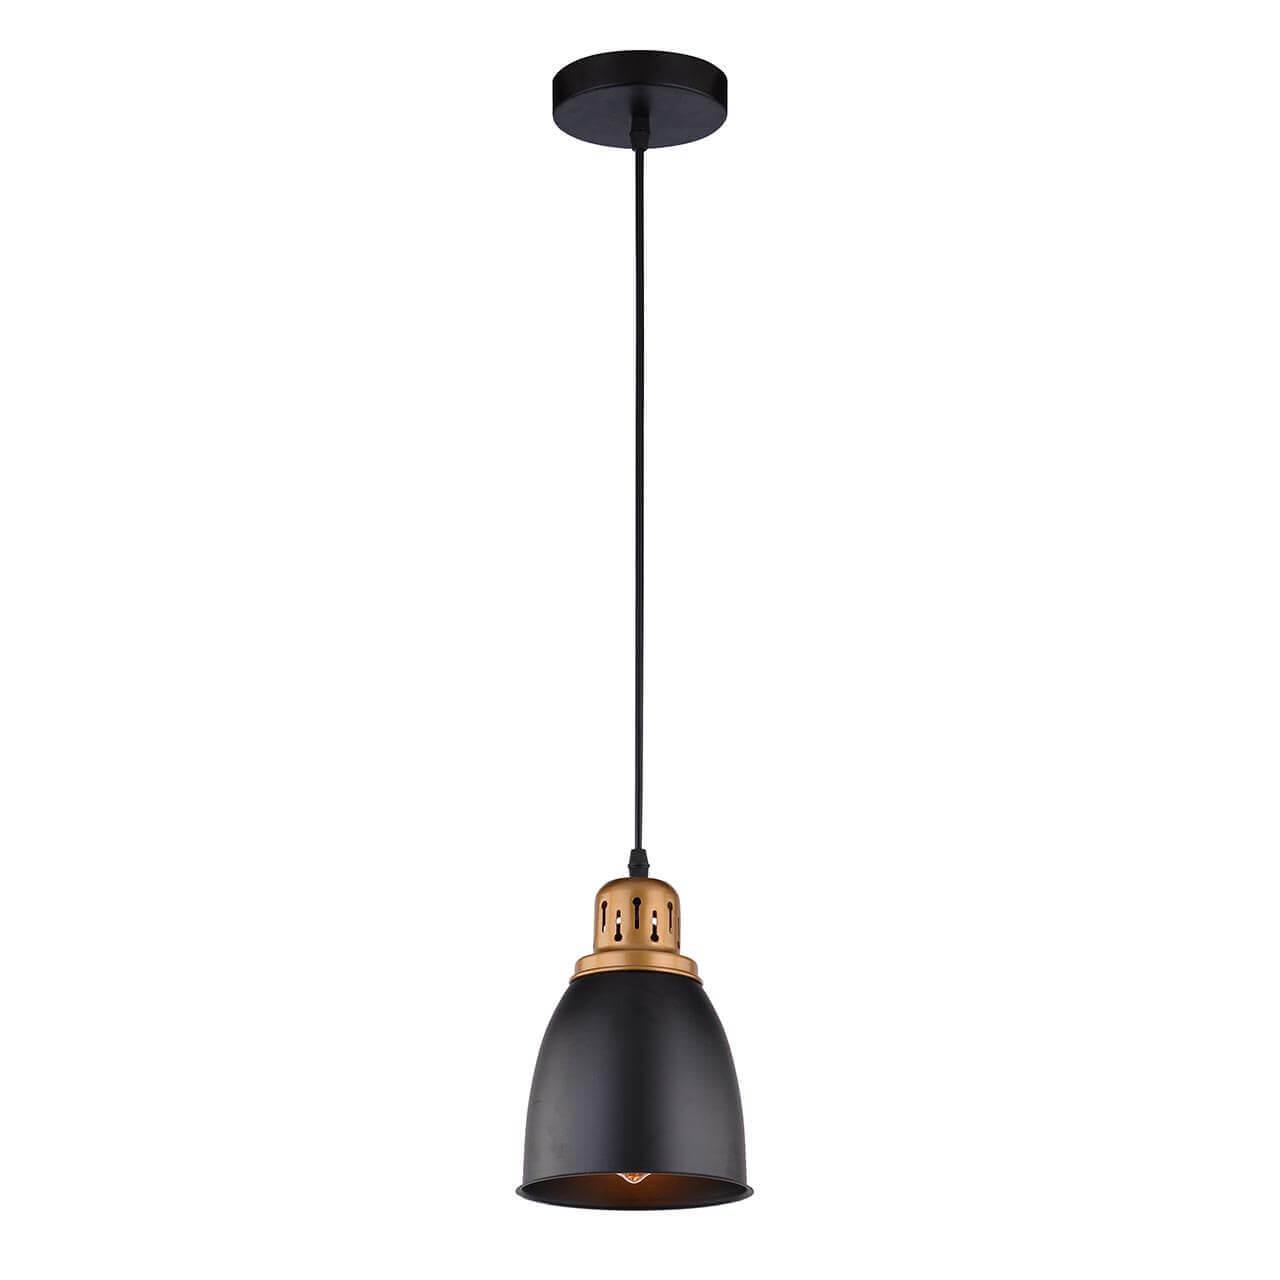 Светильник Arte Lamp A4248SP-1BK Eurica светильник arte lamp a4248sp 1bk eurica